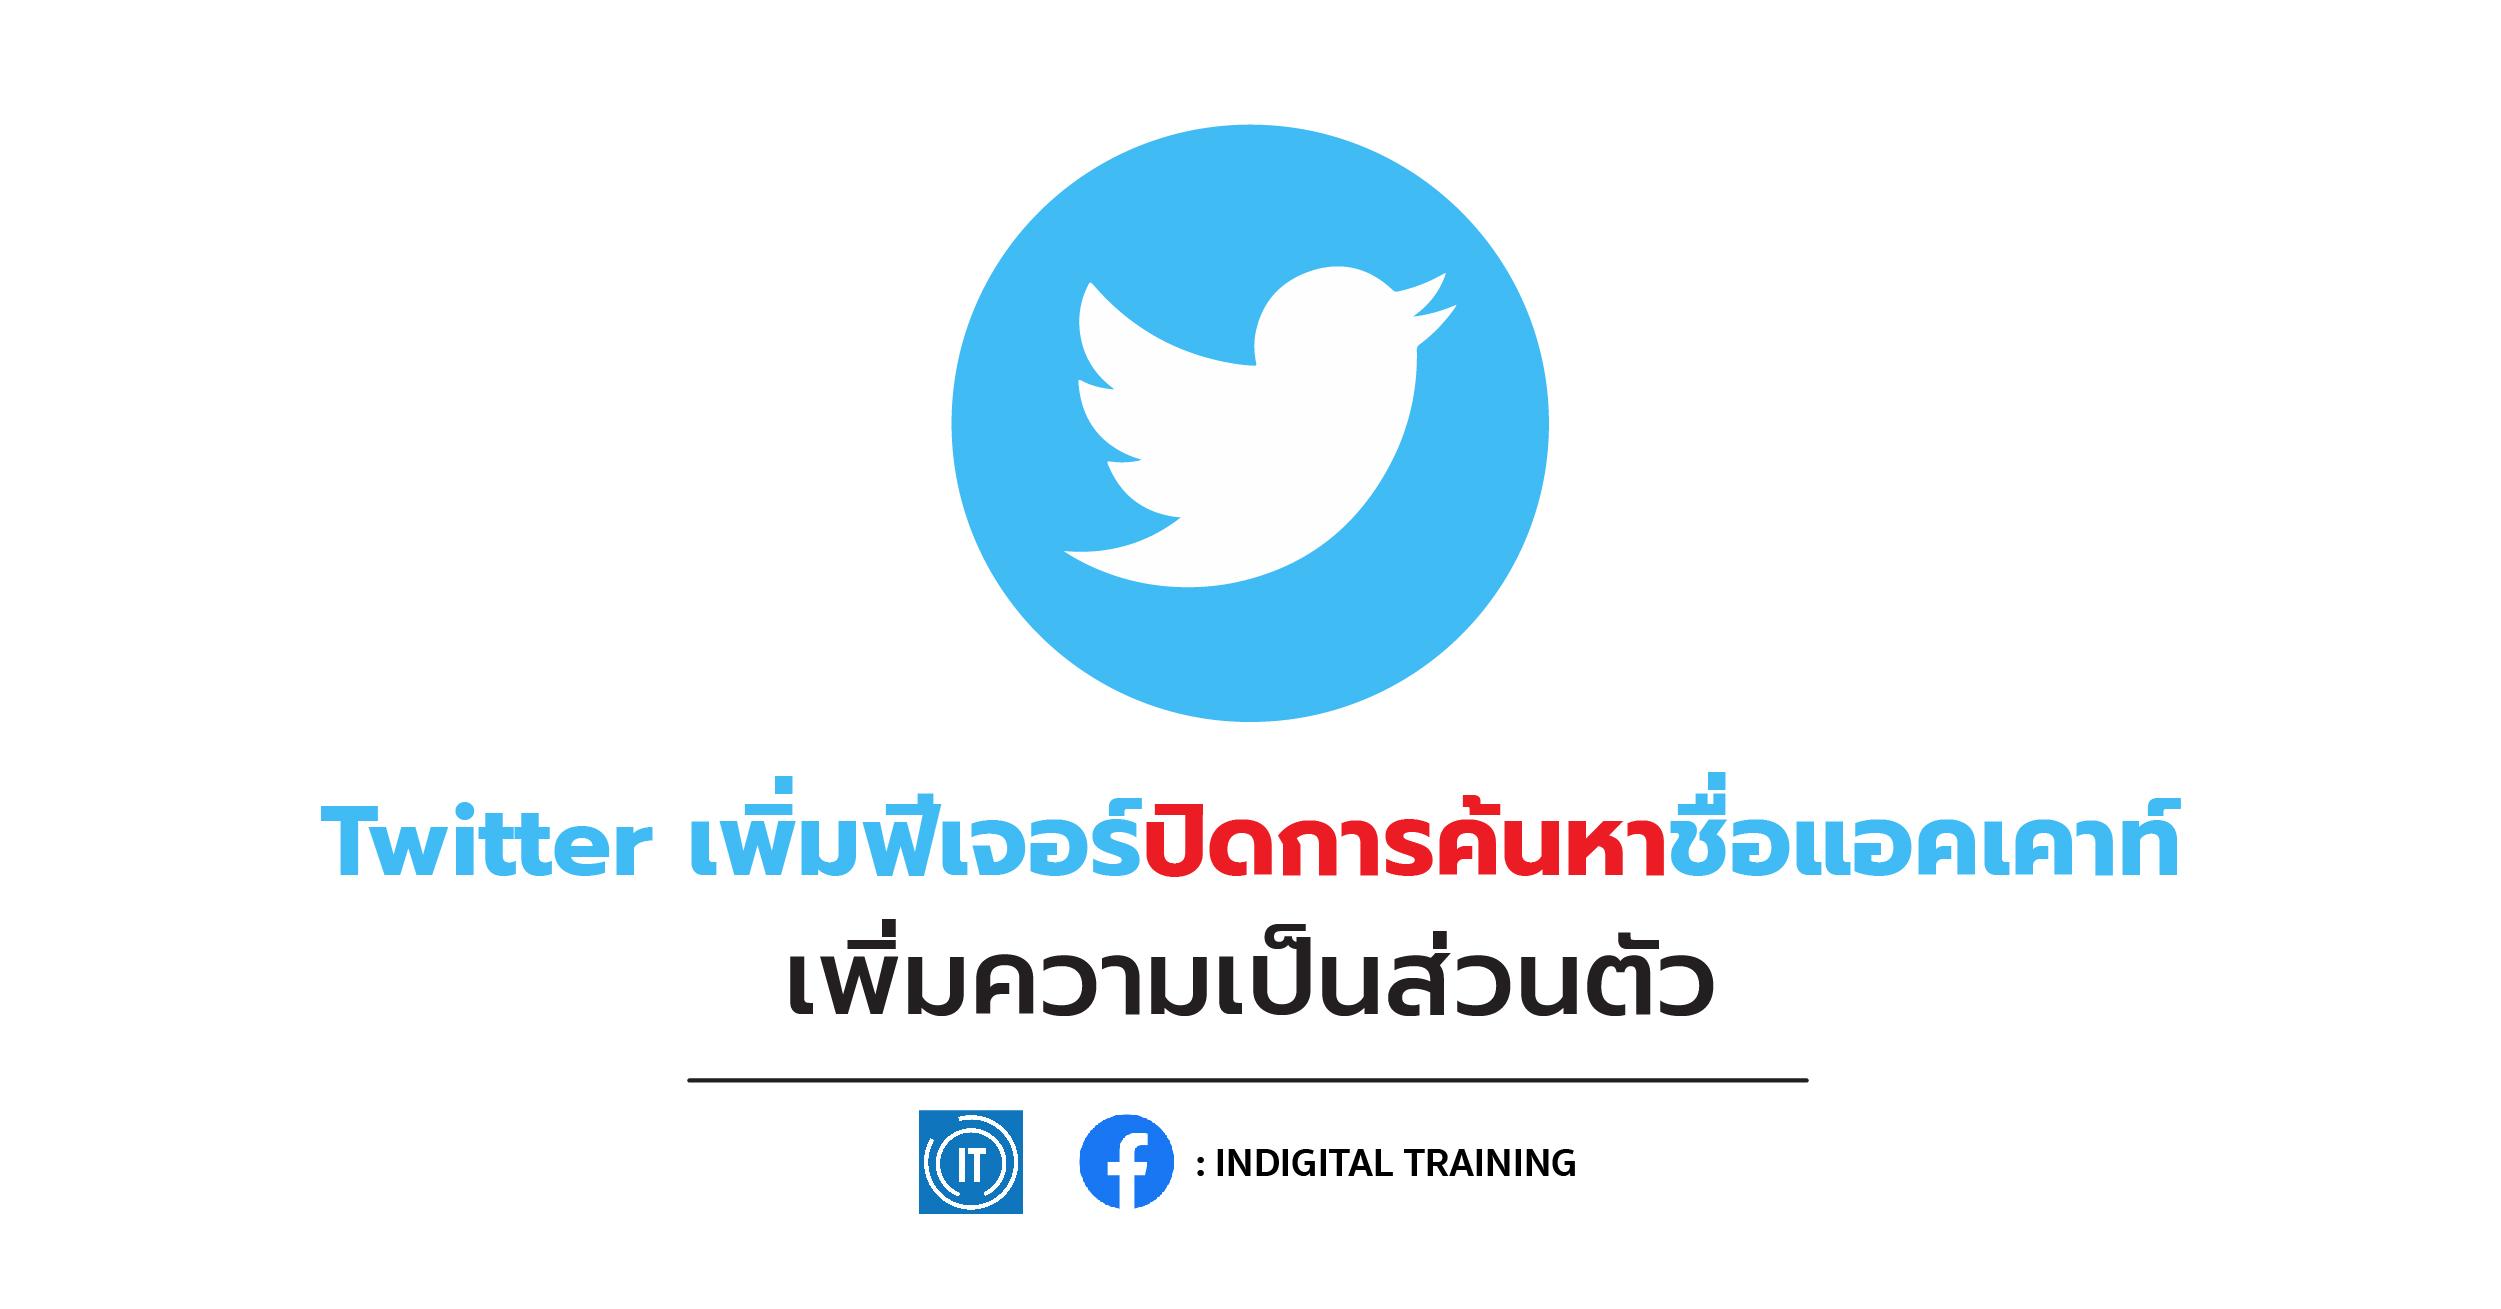 Twitter เพิ่มฟีเจอร์ปิดการค้นหาชื่อแอคเคาท์ เพิ่มความเป็นส่วนตัว